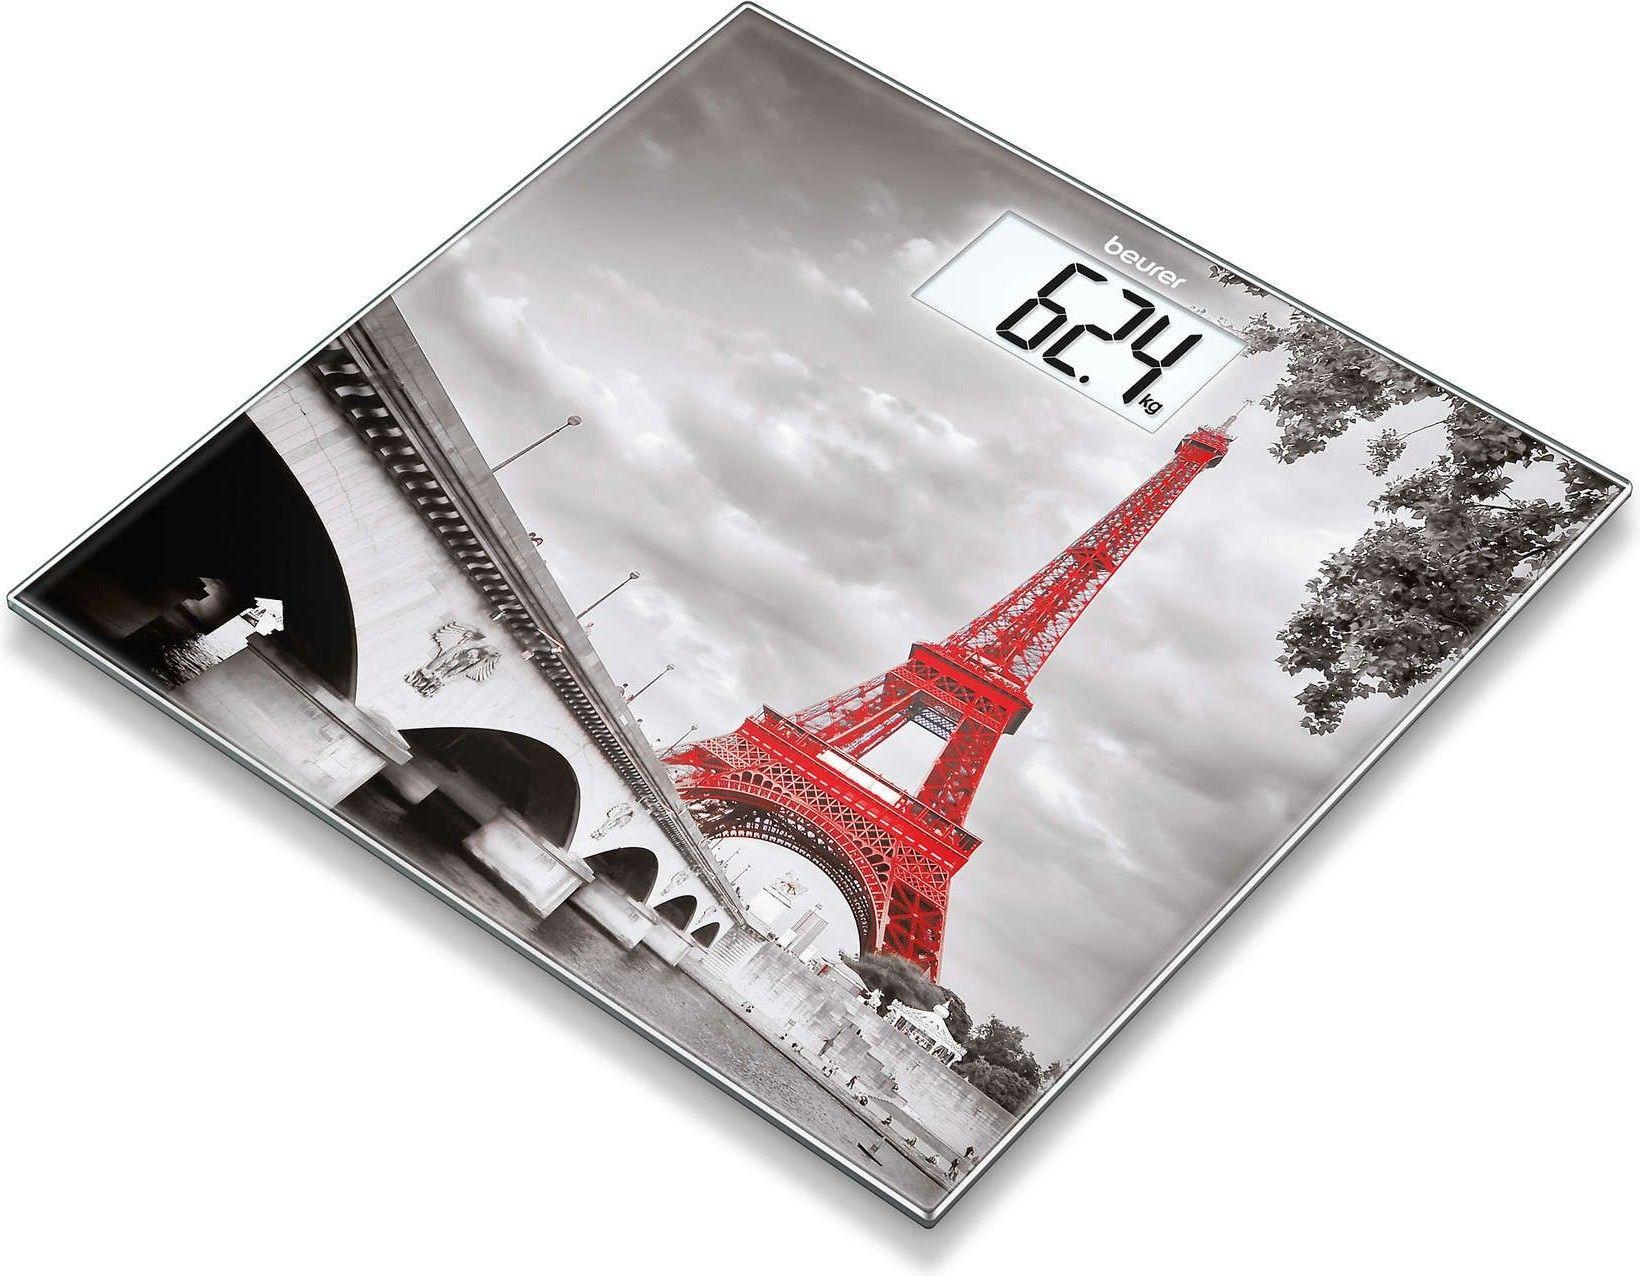 Beurer GS 203 Paris glass bathroom scale | Free Delivery ...